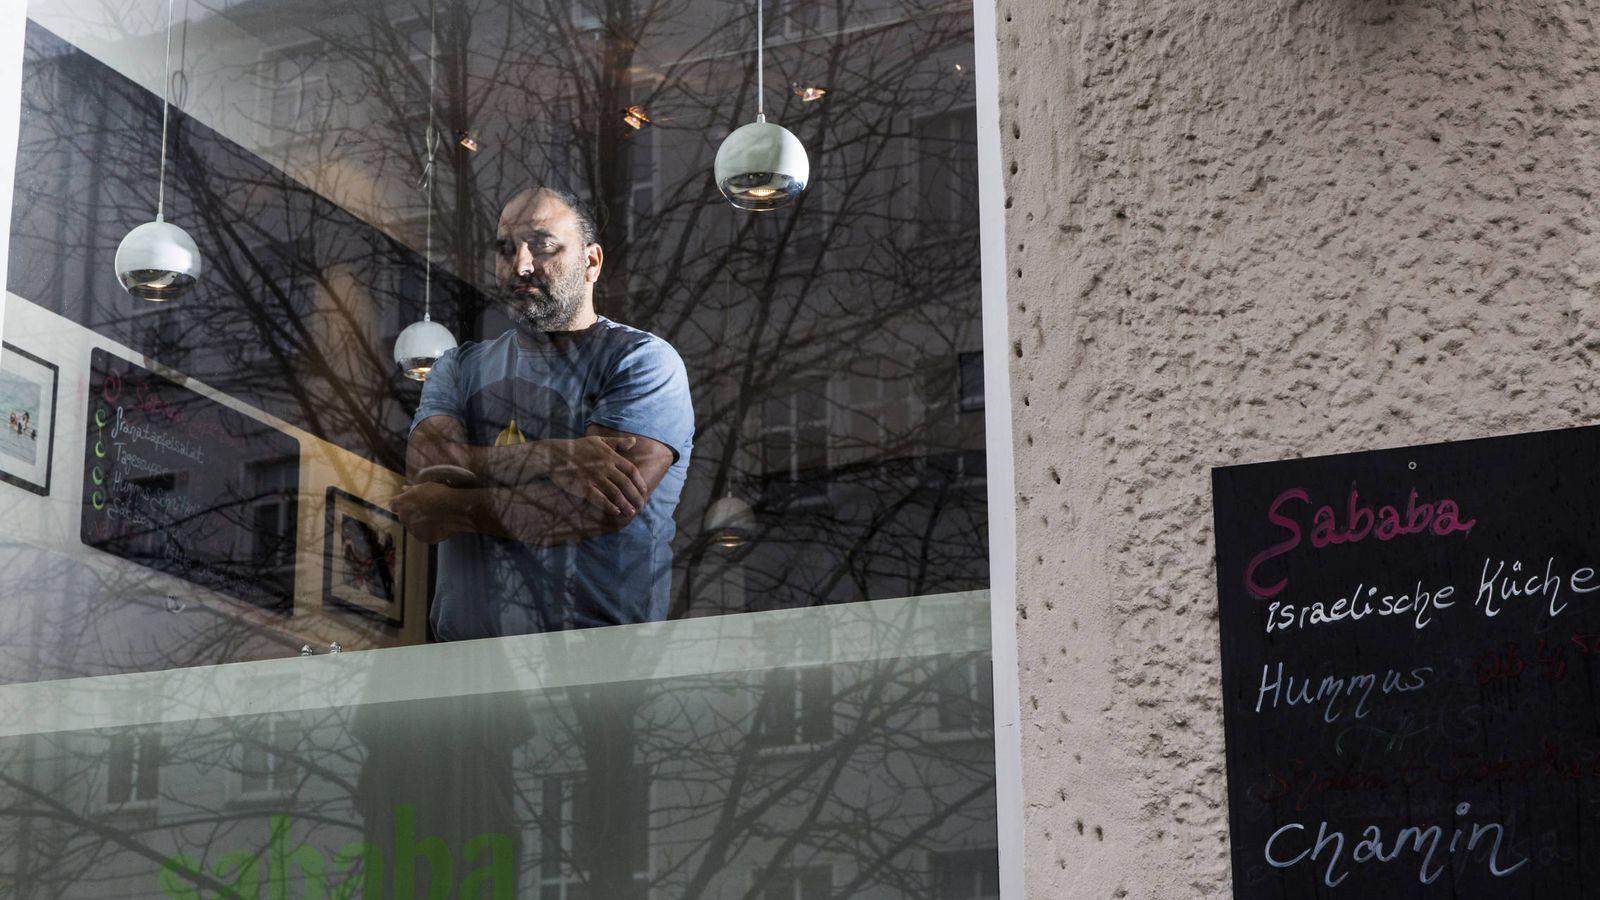 Foto: Ze'er Avrahami, dueño de un café, posa en la ventana en Berlín. (Reuters)